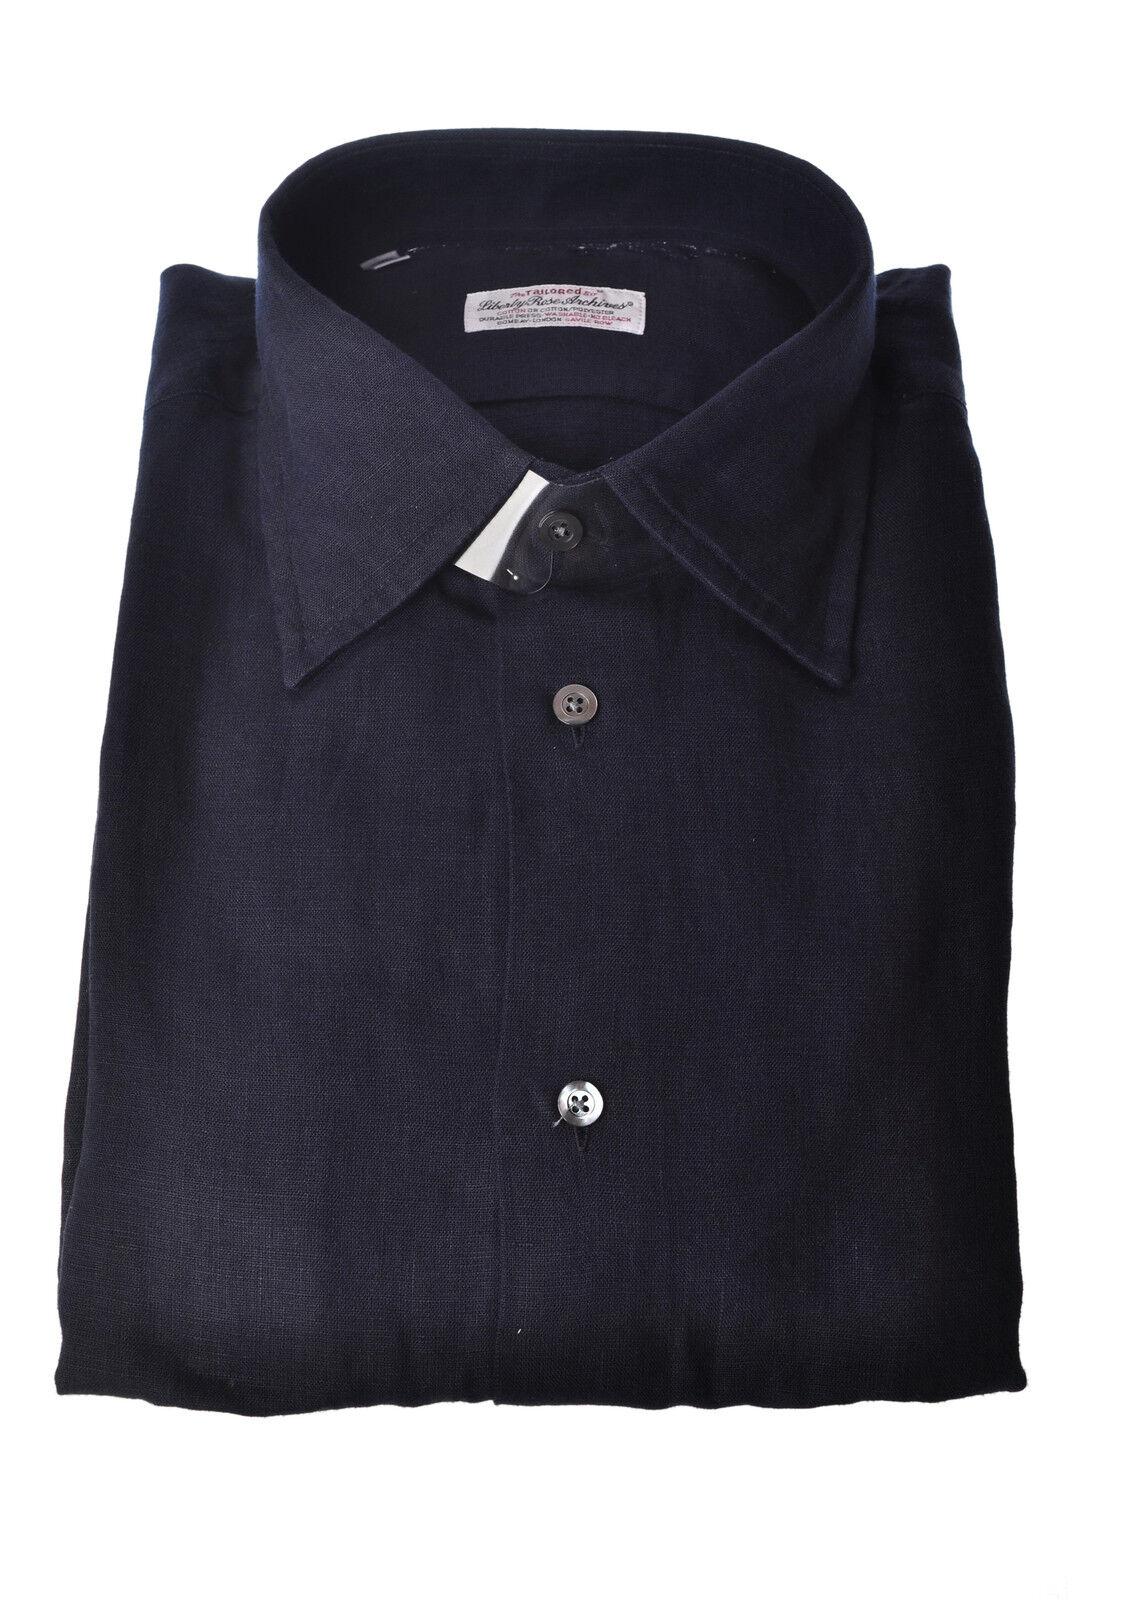 Liberty Rose - Shirts-Shirt - Man - Blau - 3463717D184447